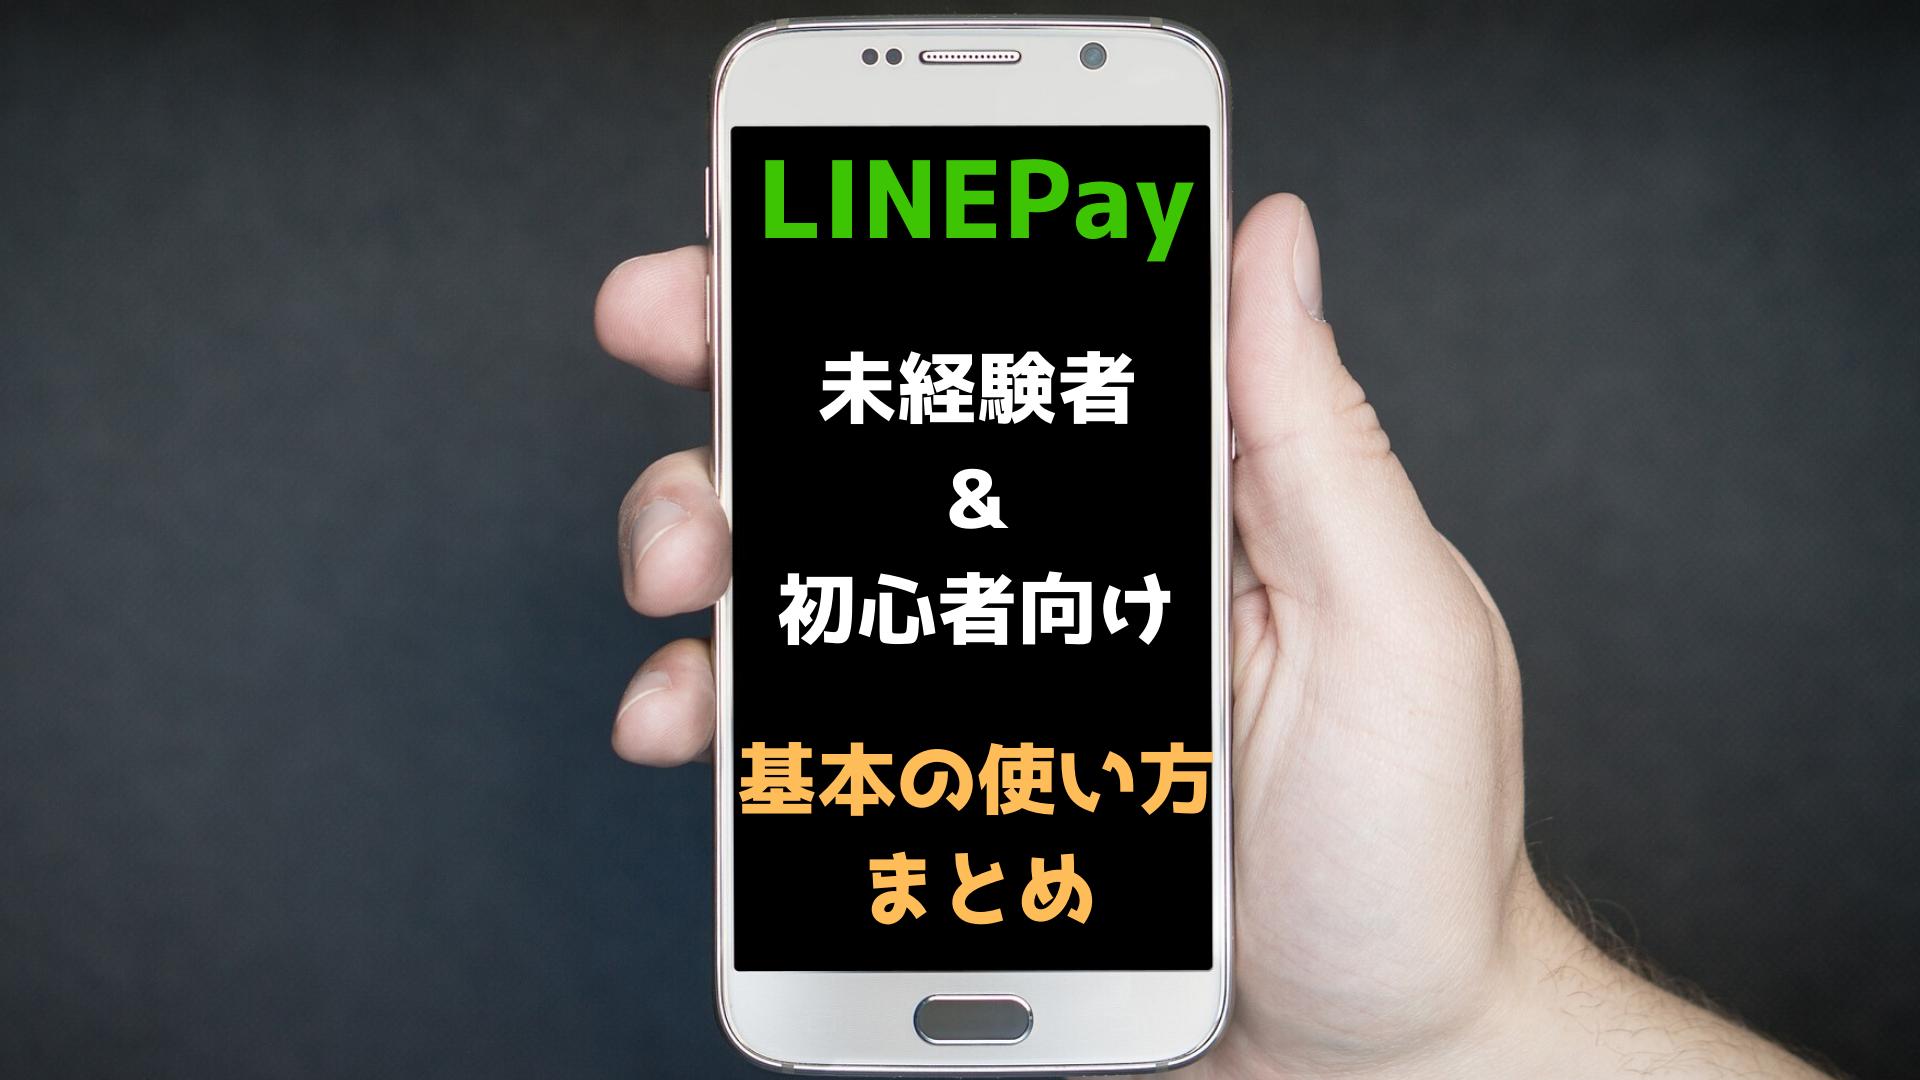 【LINE Pay】未経験者・初心者向け 使い方まとめ